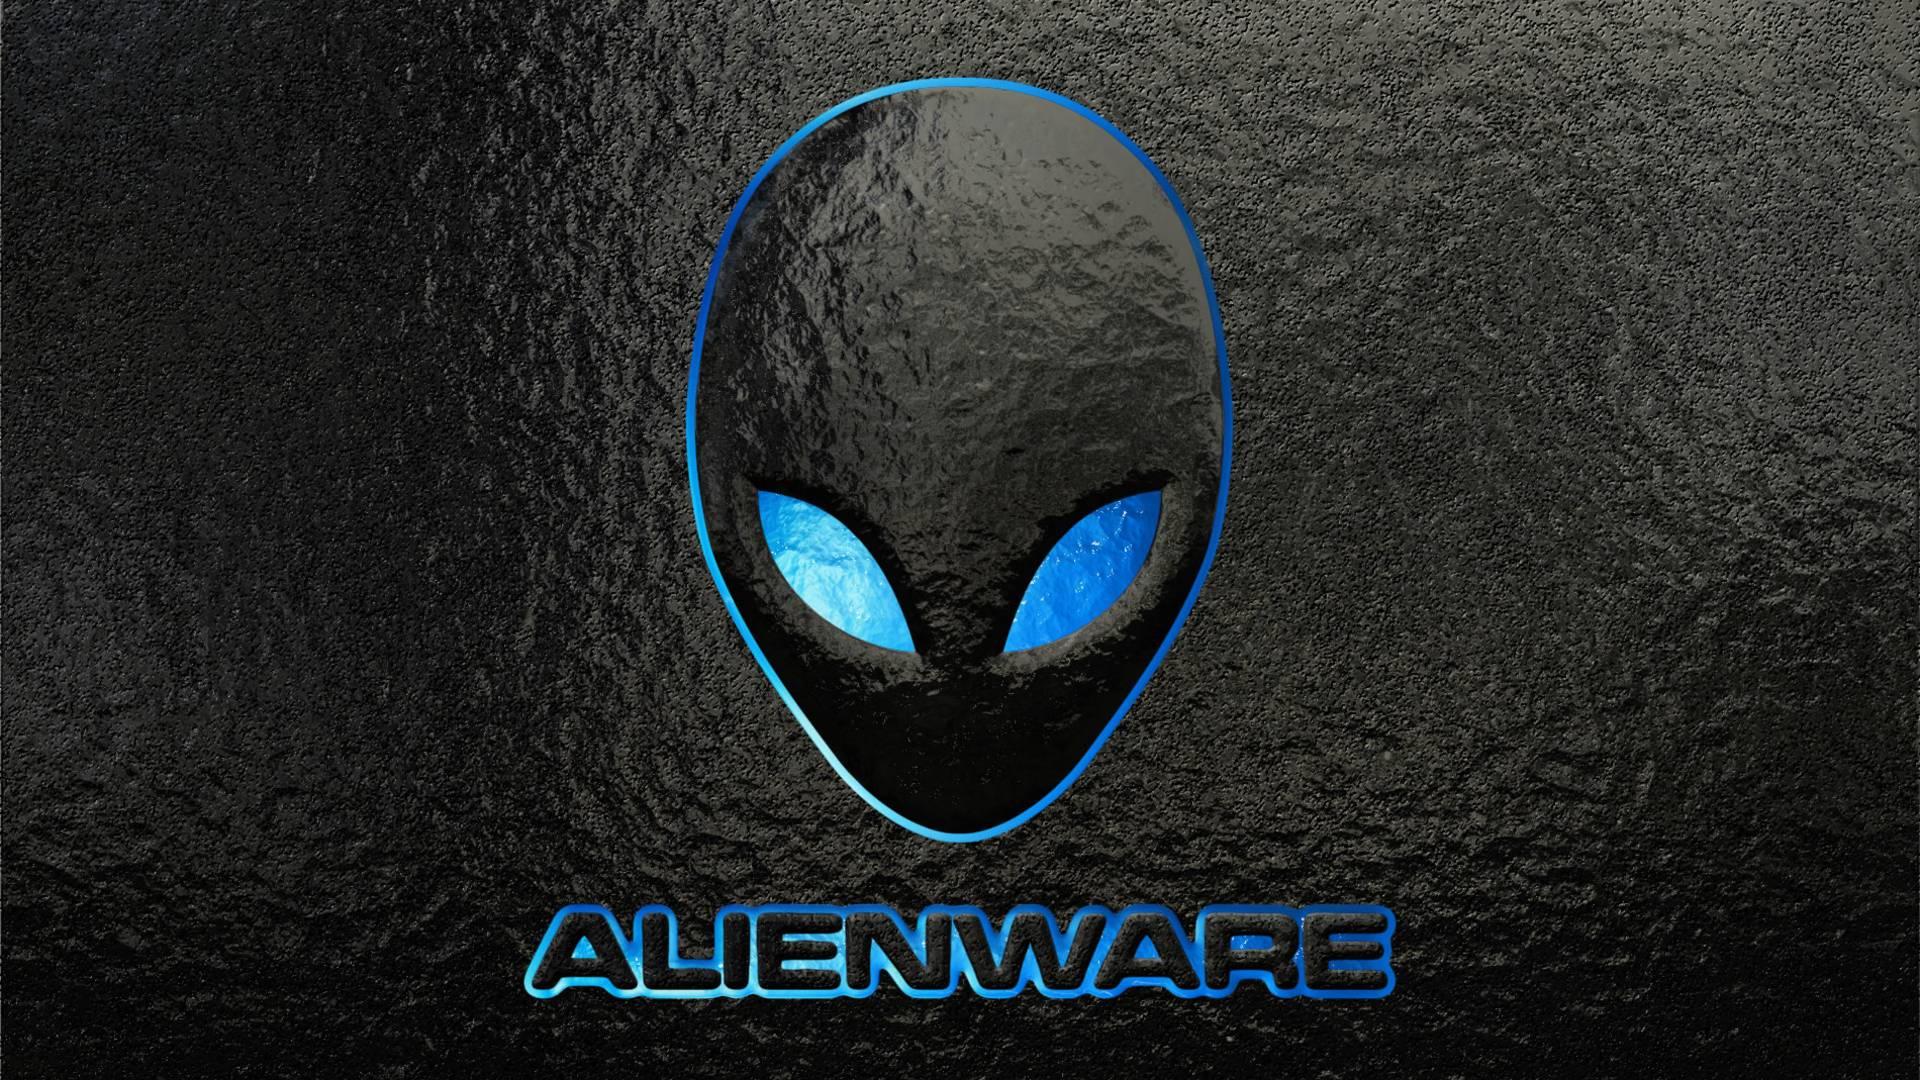 alienware hd wallpapers wallpaper cave. Black Bedroom Furniture Sets. Home Design Ideas